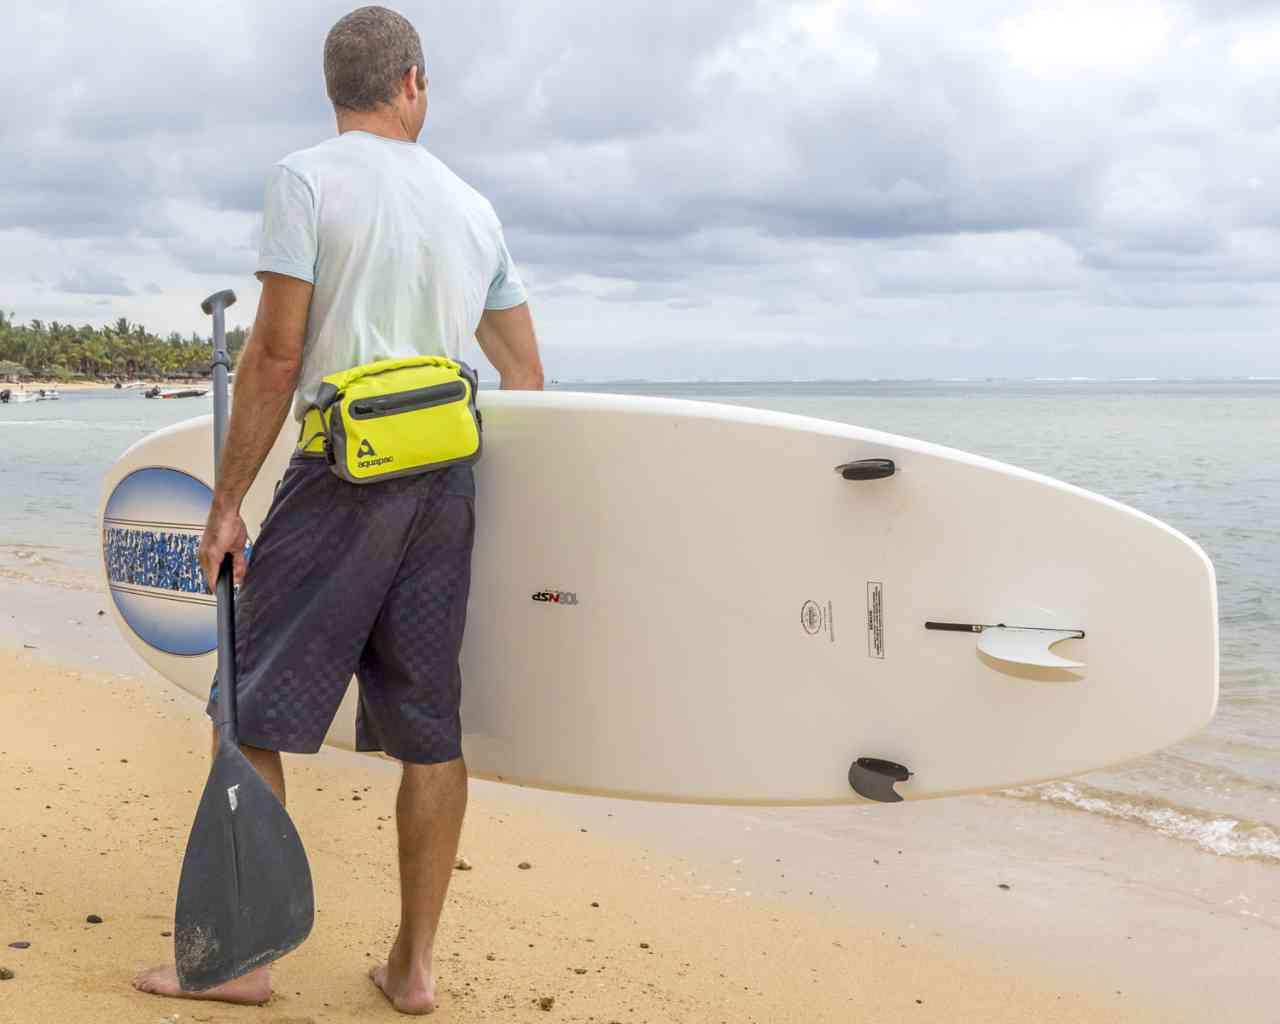 Водонепроницаемый чехол для документов - Aquapac 821. Aquapac - №1 в мире водонепроницаемых чехлов и сумок. Фото 10